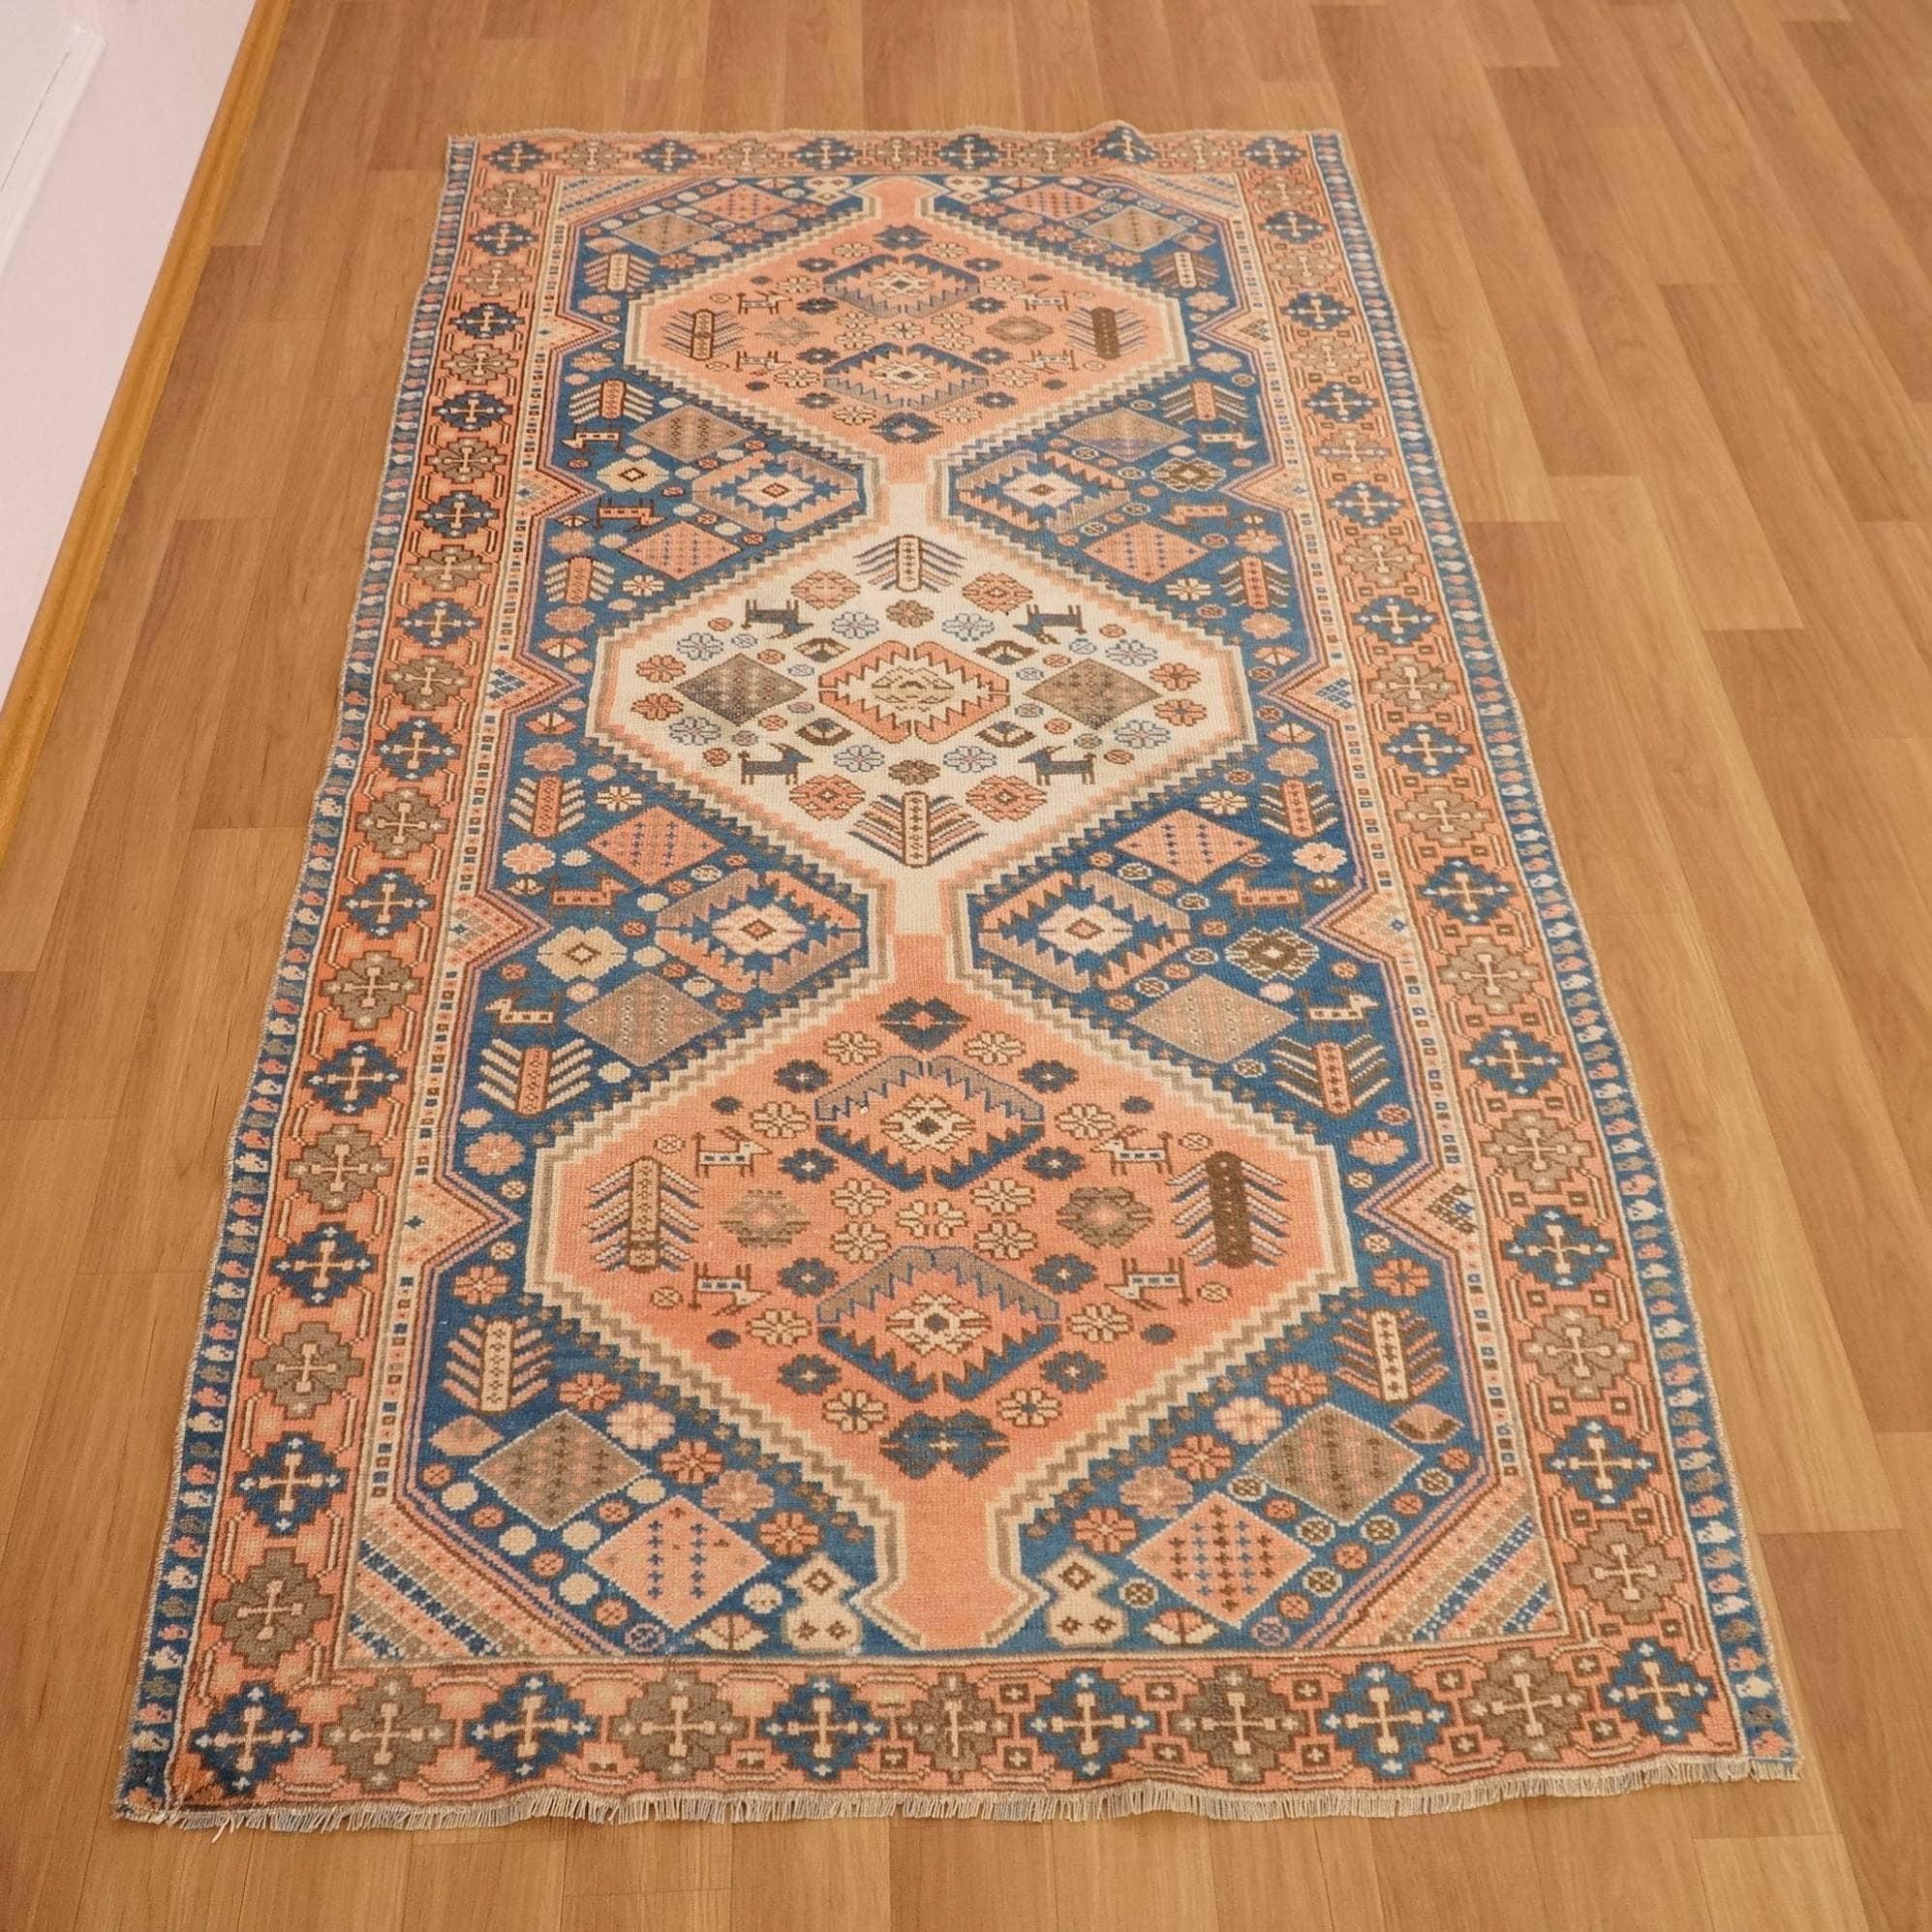 Kitchen rug Turkish area rug Oushak rug Handmade rug Boho rug Kidsroom rug 3.5 x 6.4 Ft Cod5797 Aztec rug Oriental rug Vintage rug